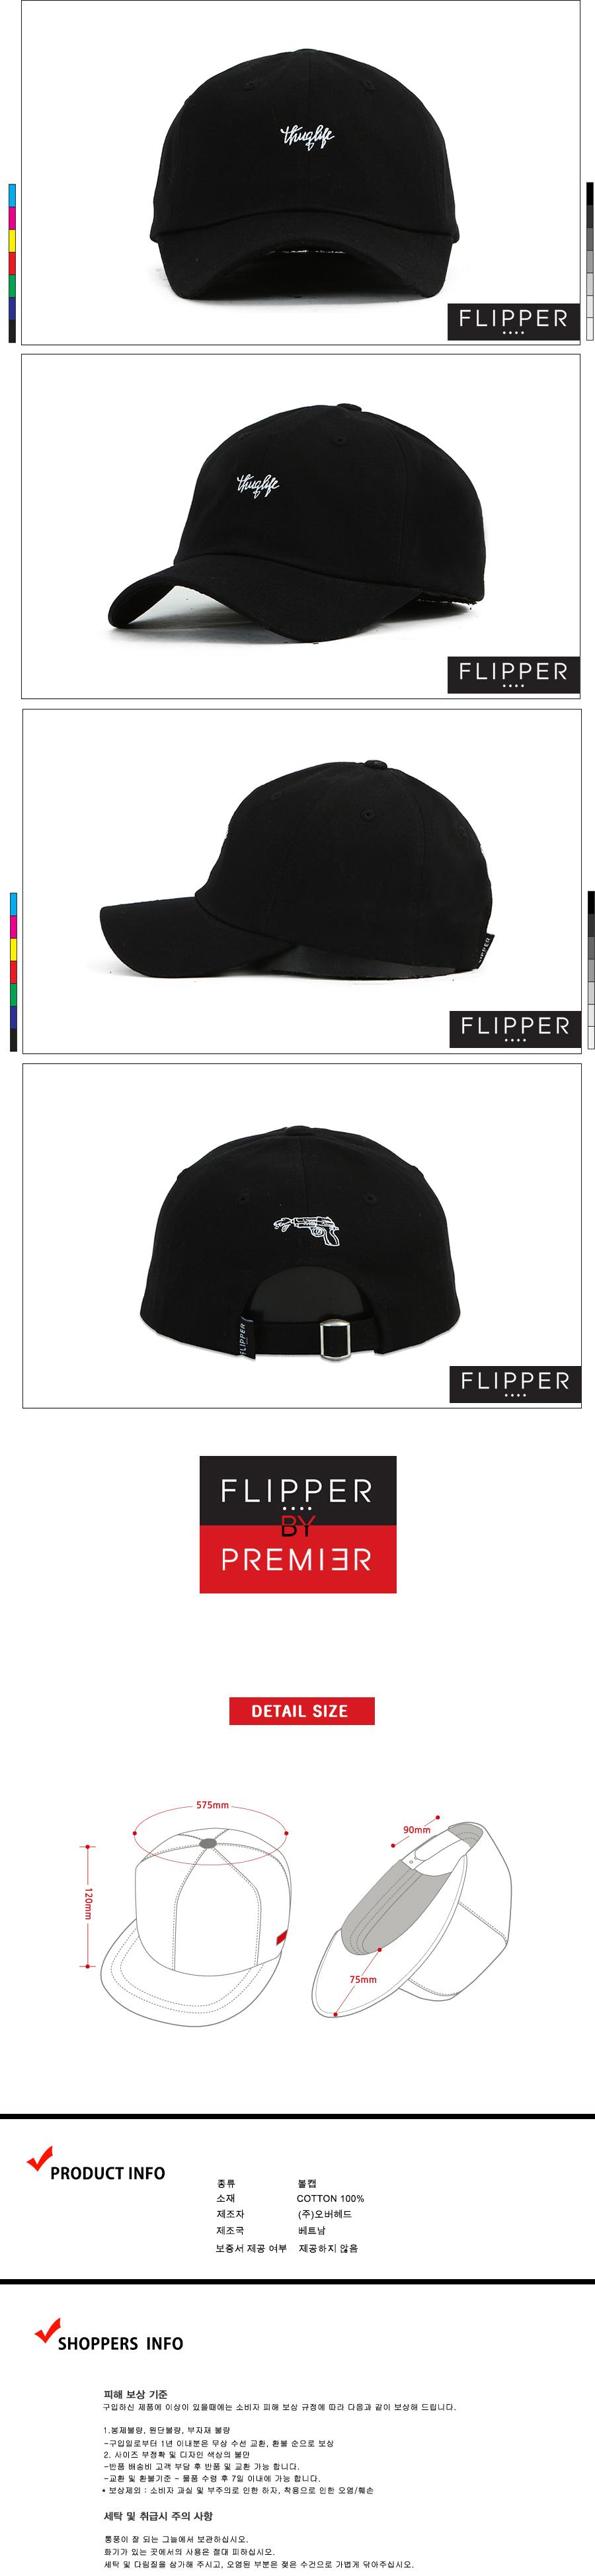 [ PREMIER ] [Premier] Flipper Ball Cap Thug Life Black (FL177)